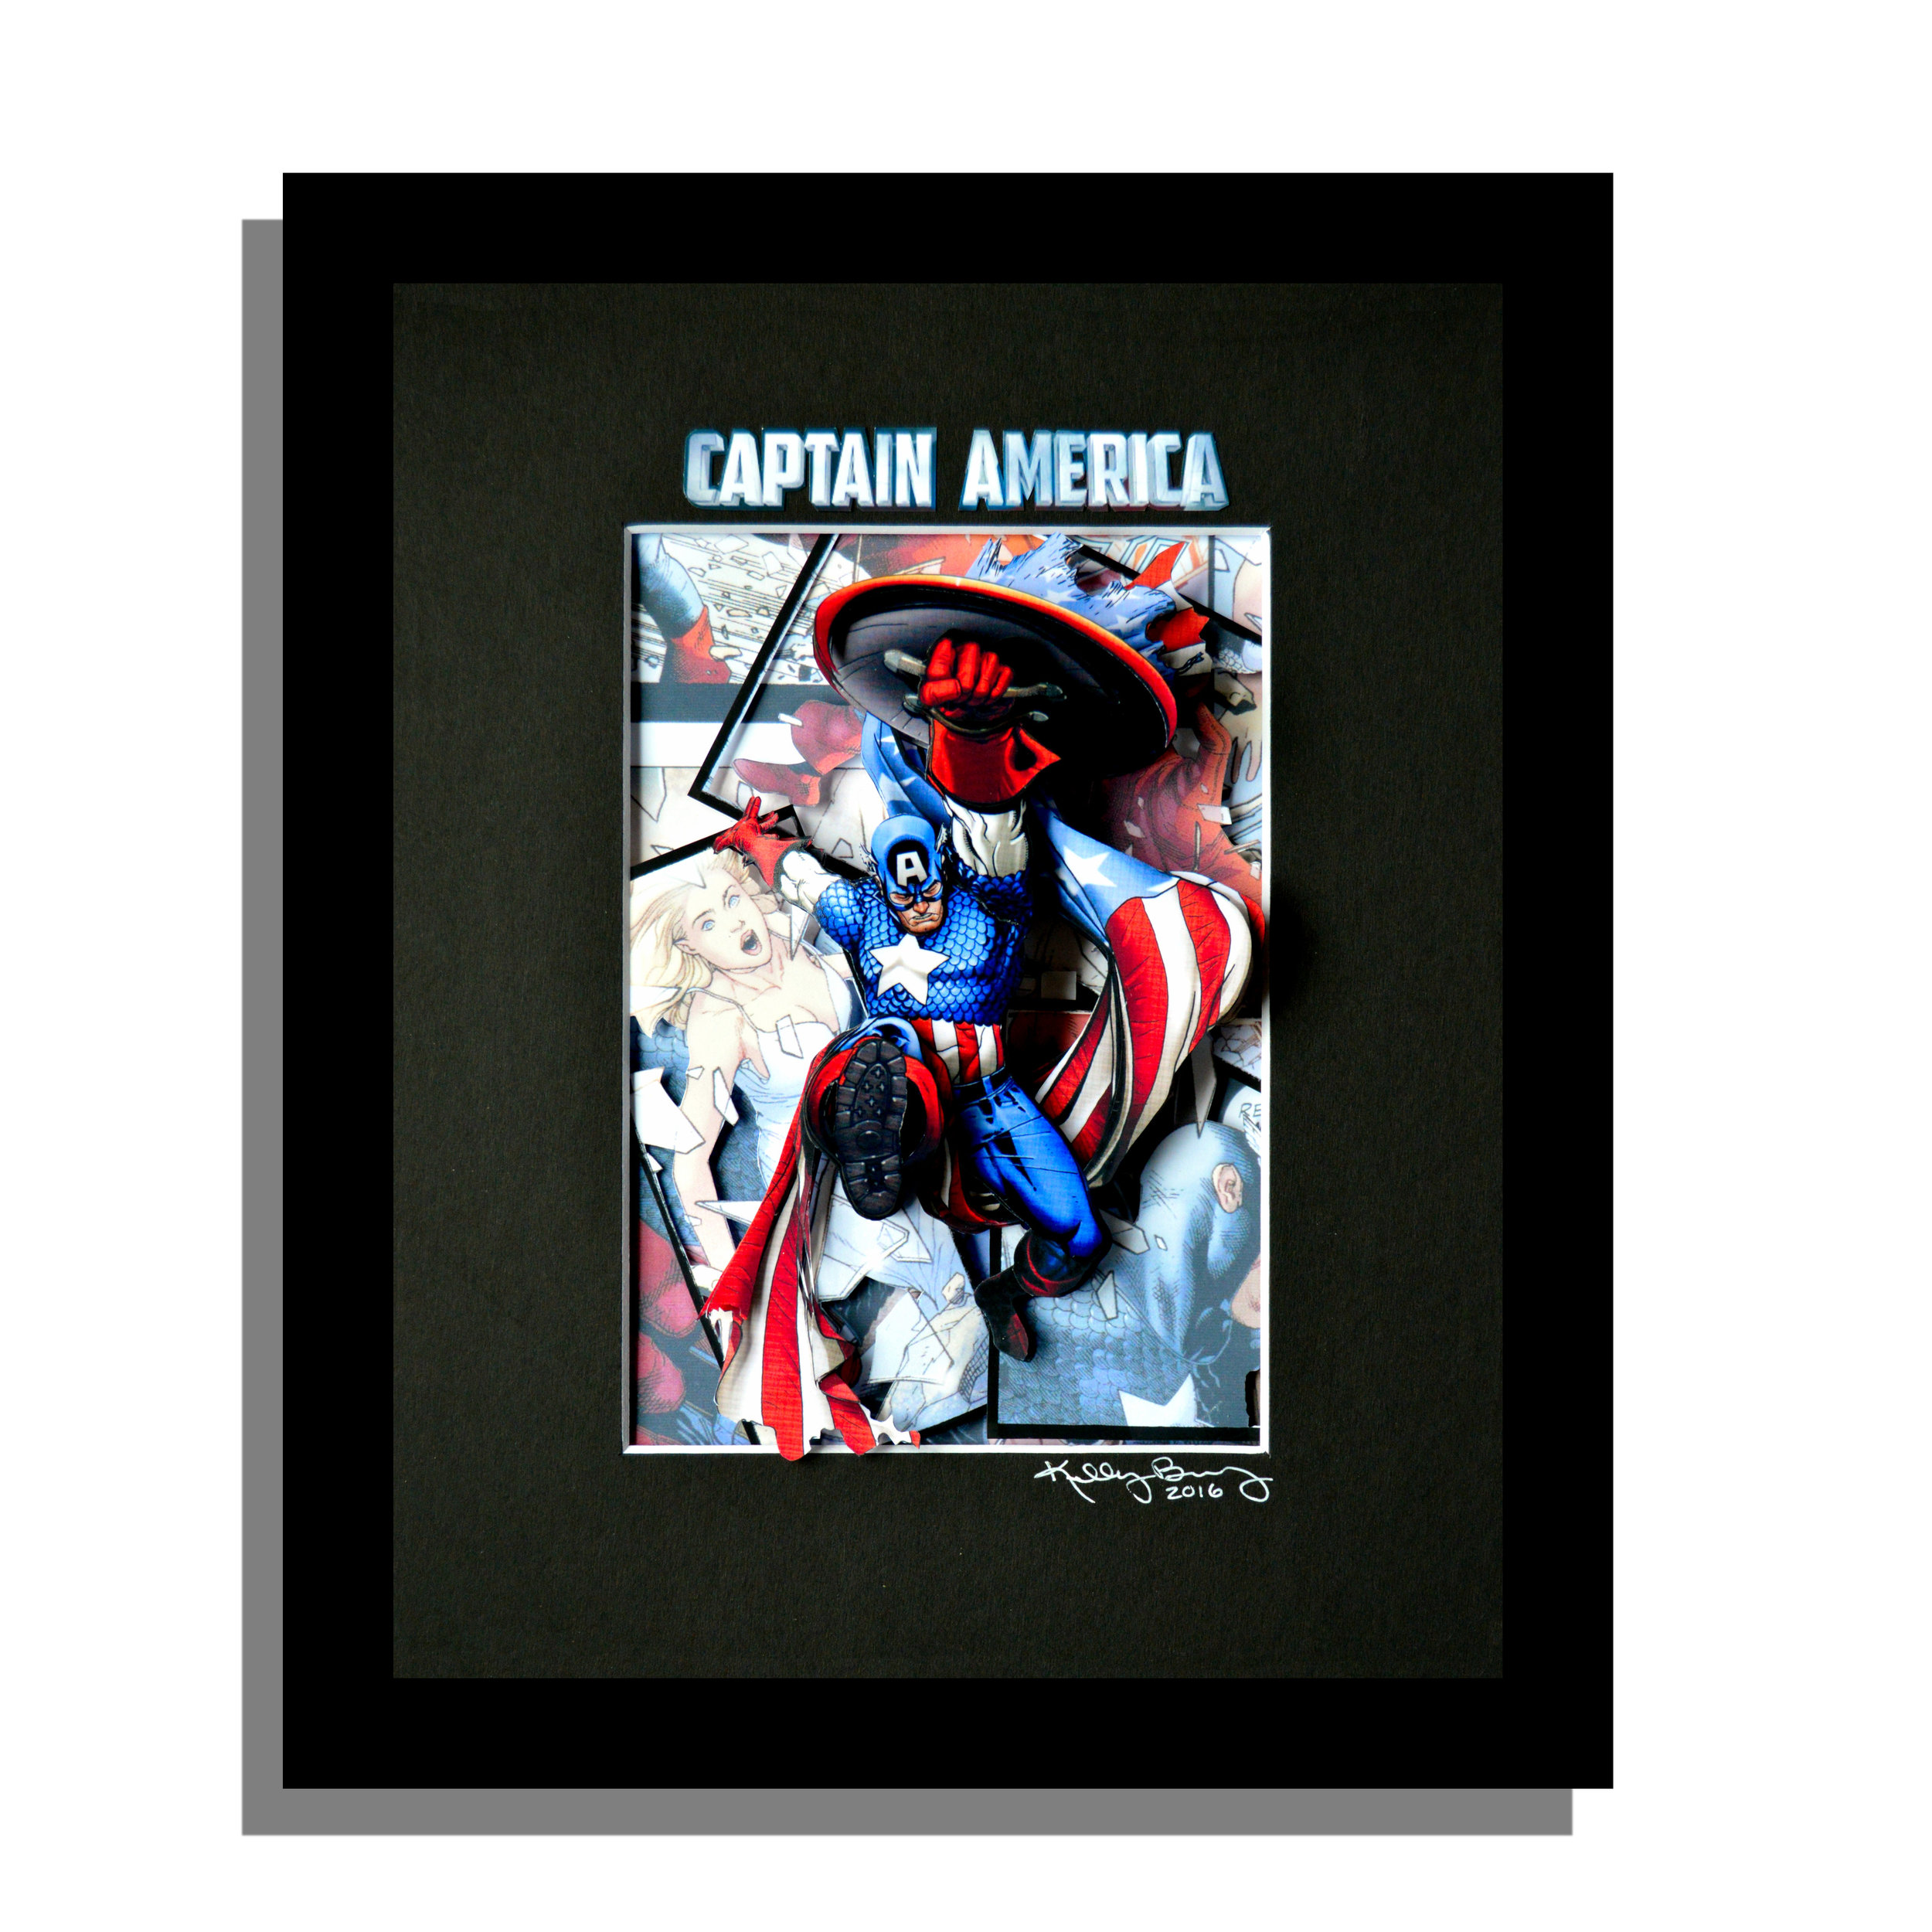 CaptainAmericaA2.jpg